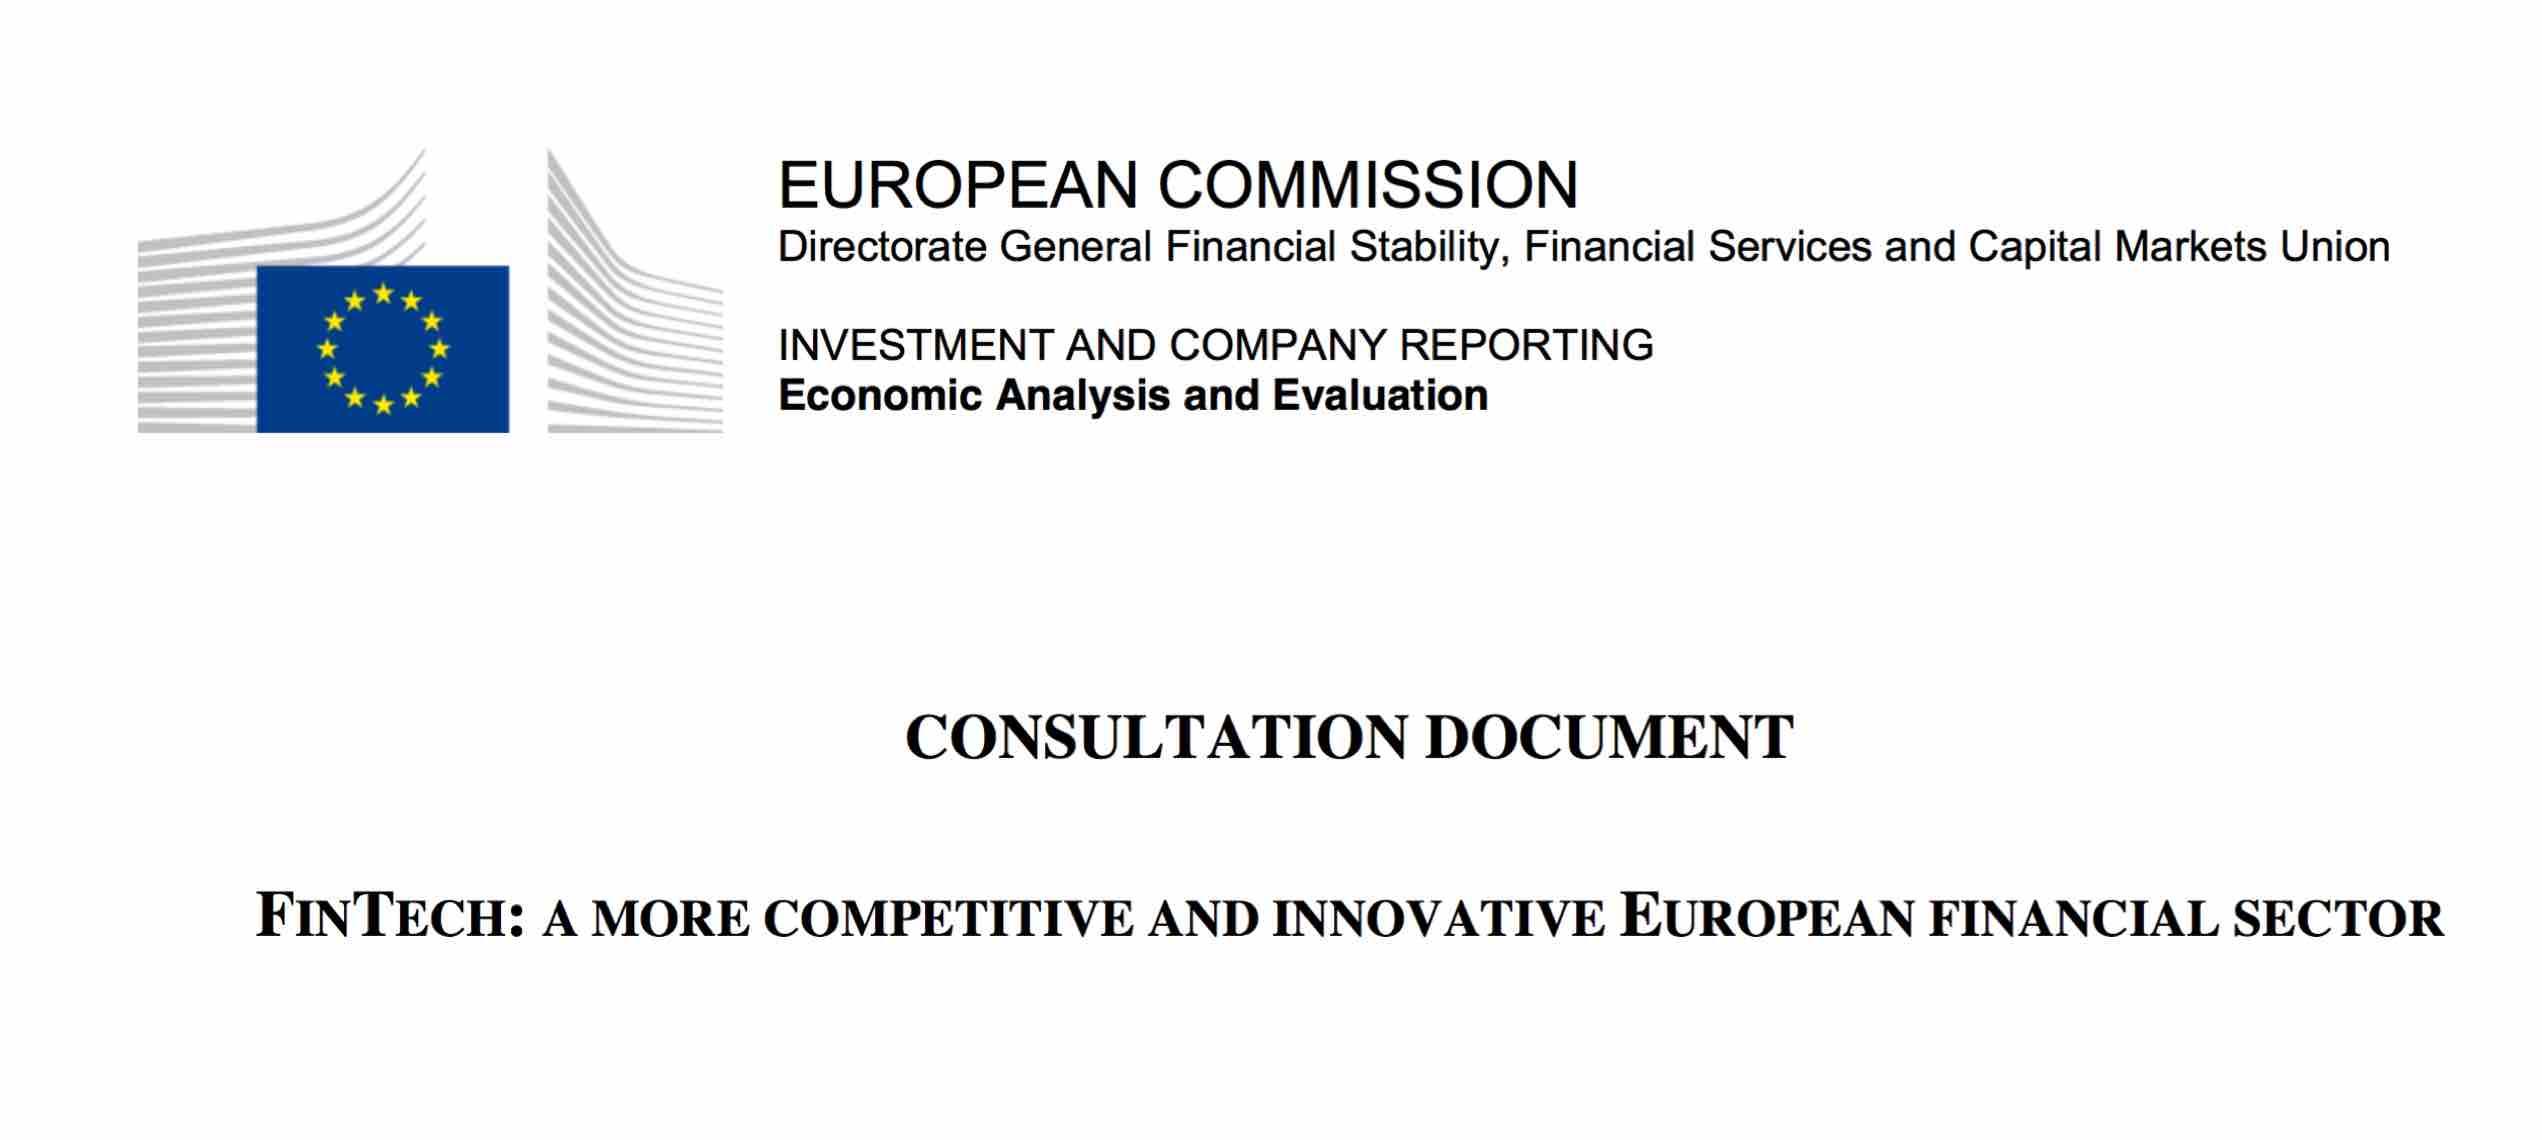 Europai Bizottsag FinTech Versenykepesebb es innovativabb europai penzugyi szektor